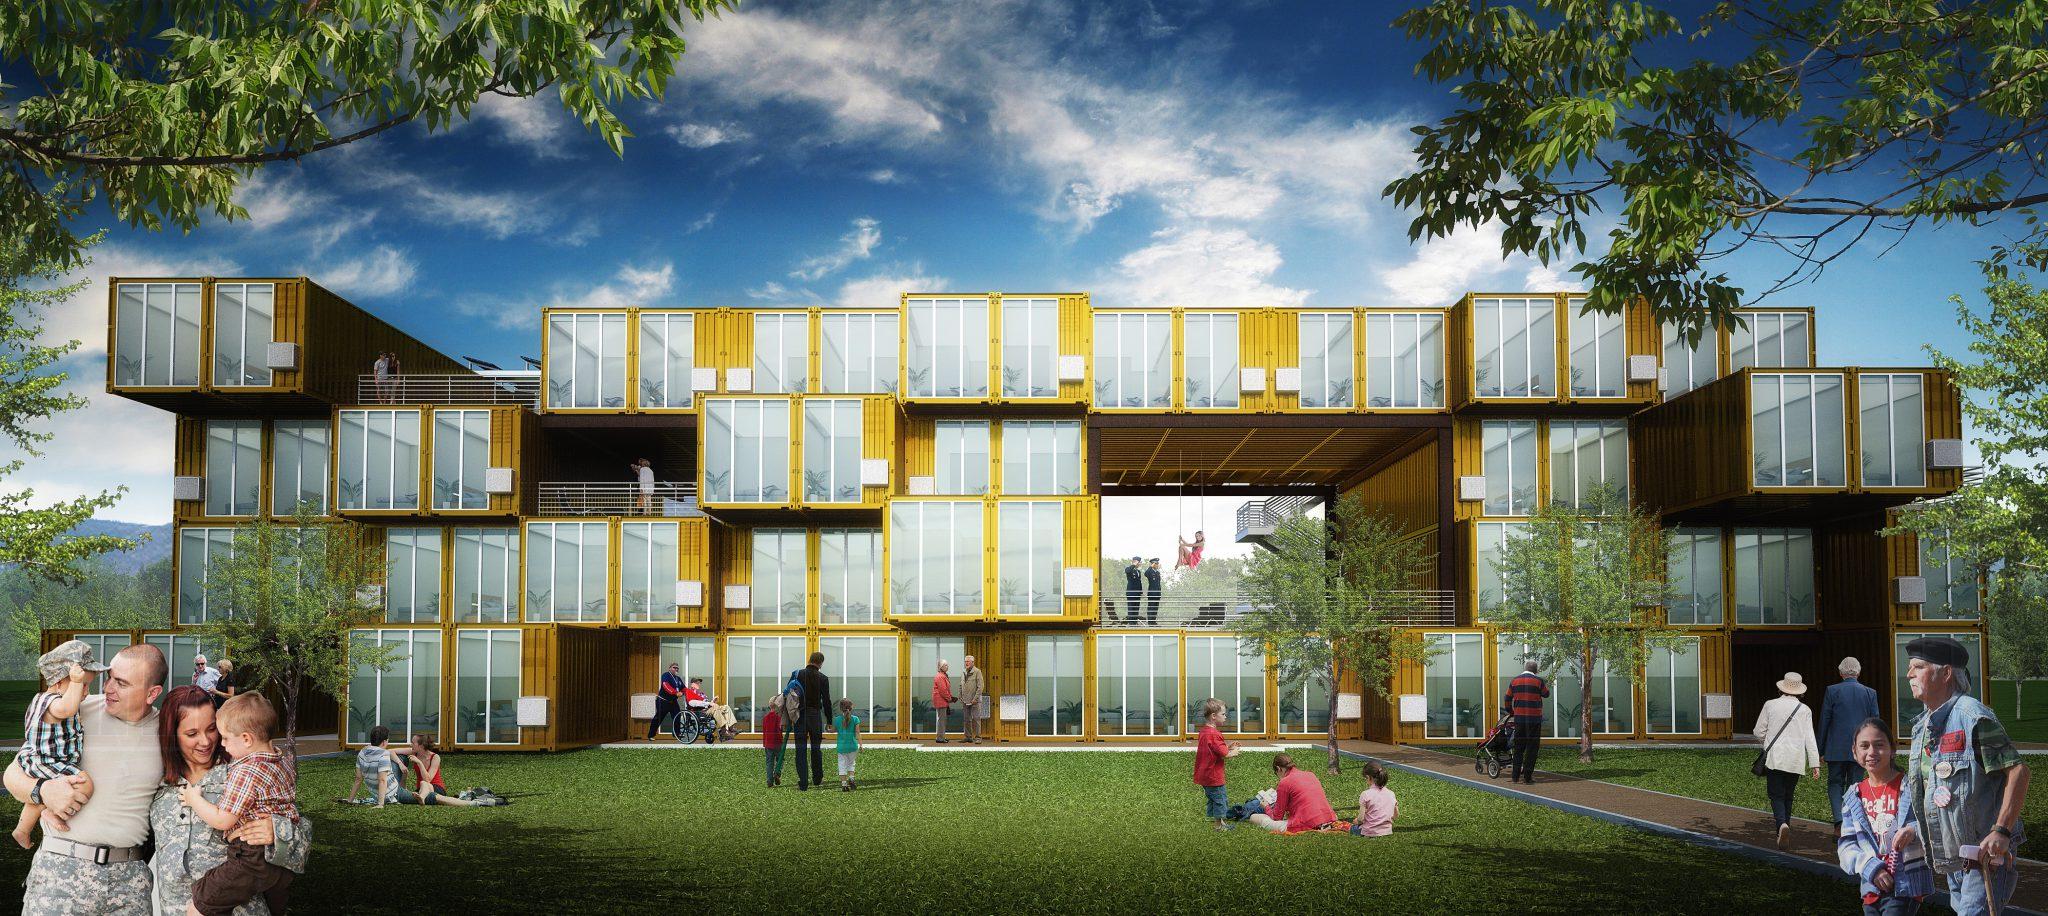 LiCCo PREFAB Housing